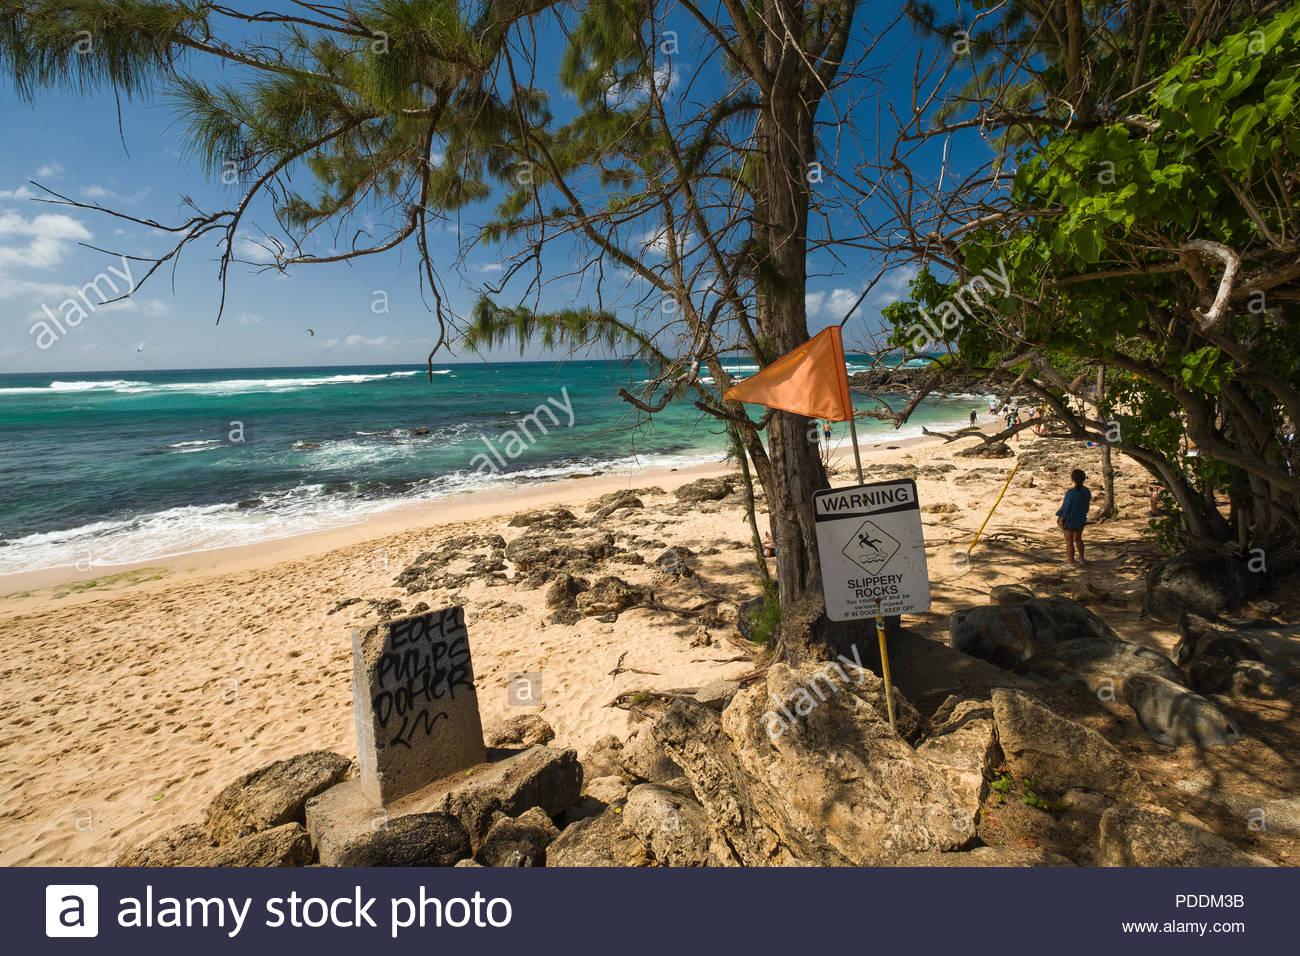 Warning sign for slippery rocks posted at Laniakea Beach, Haleiwa, Oahu, Hawaii, USA - Stock Image